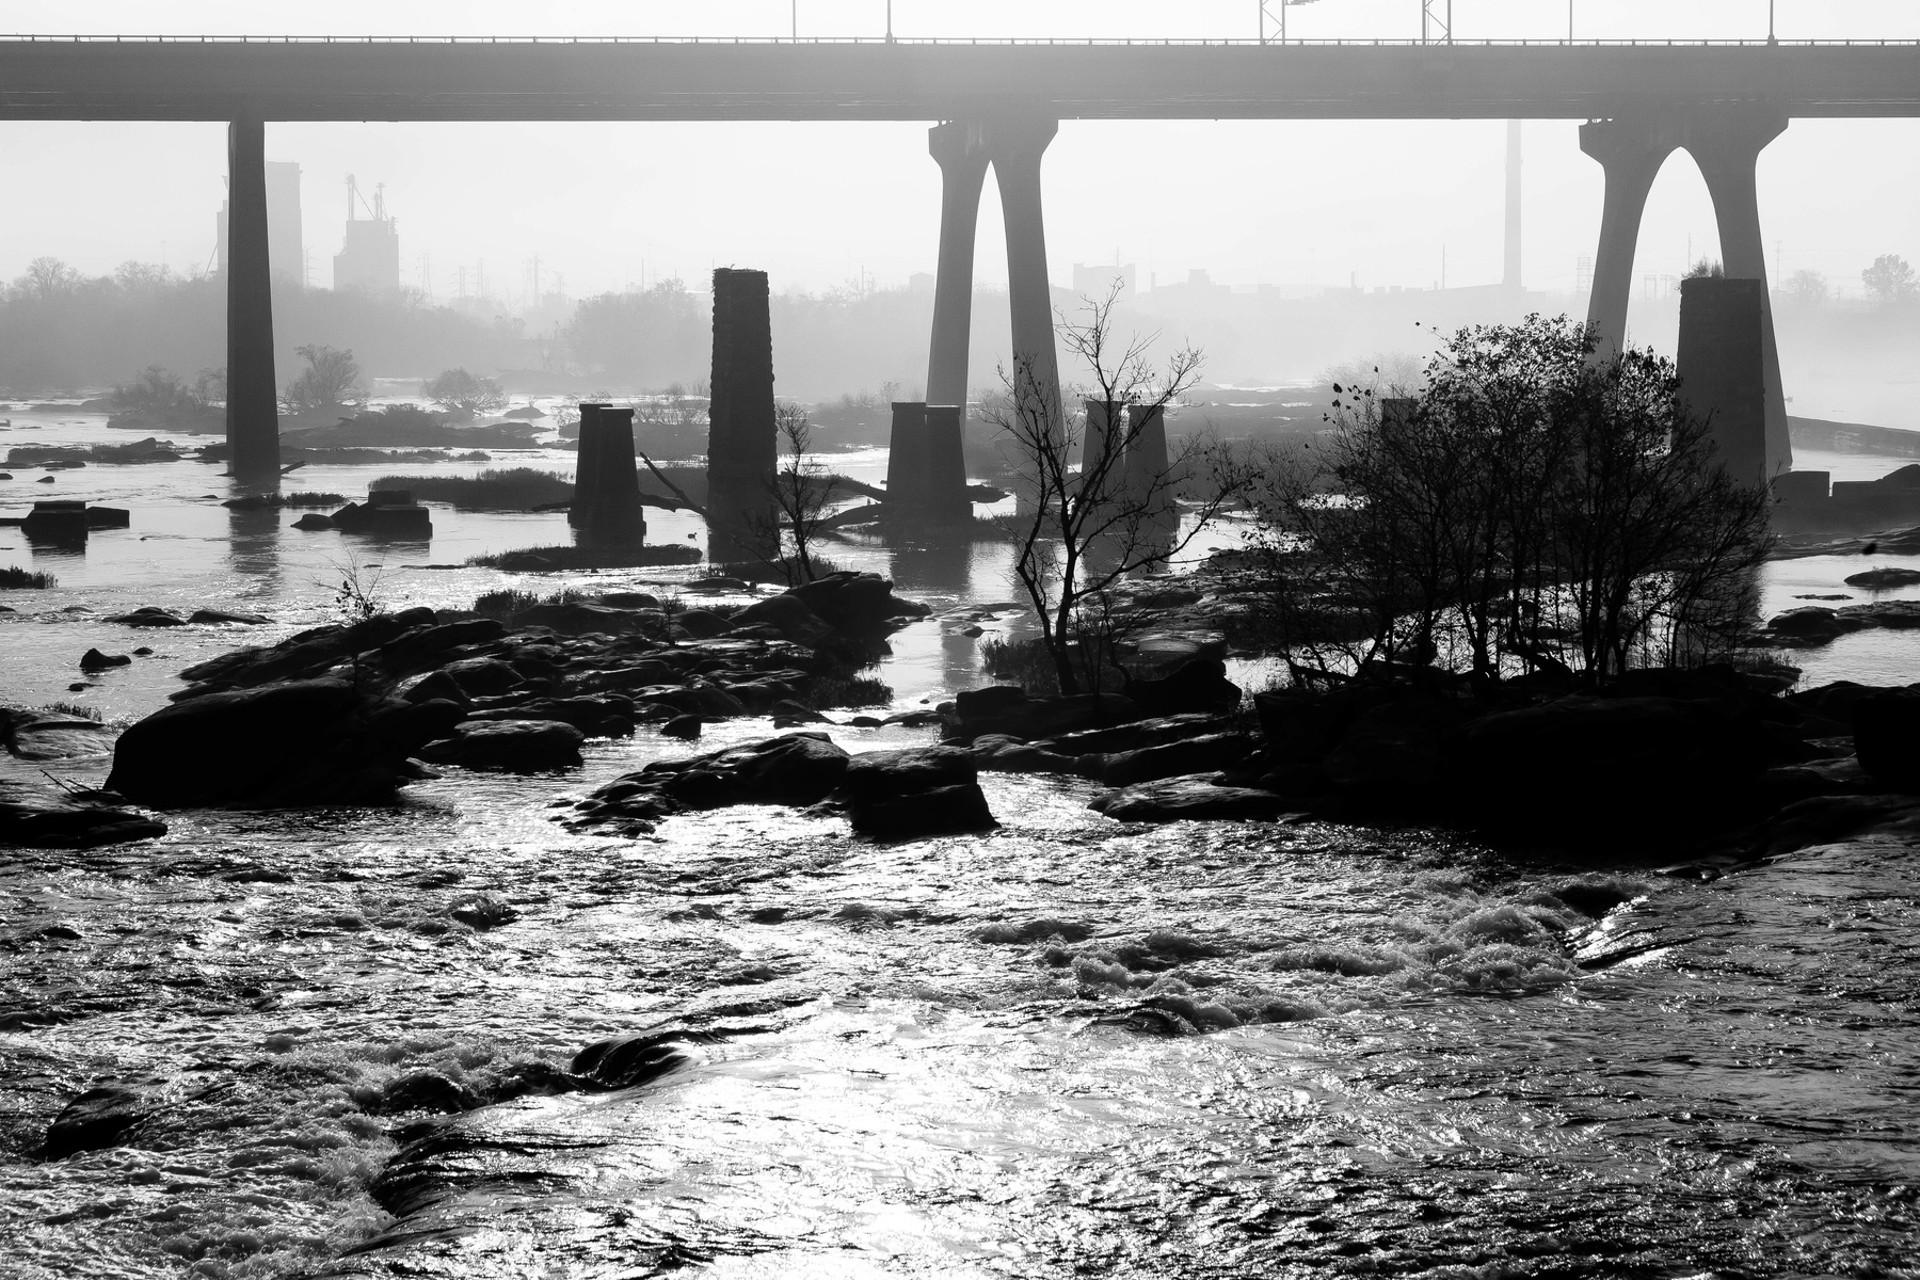 james river bridge/fog II by Alex Nyerges